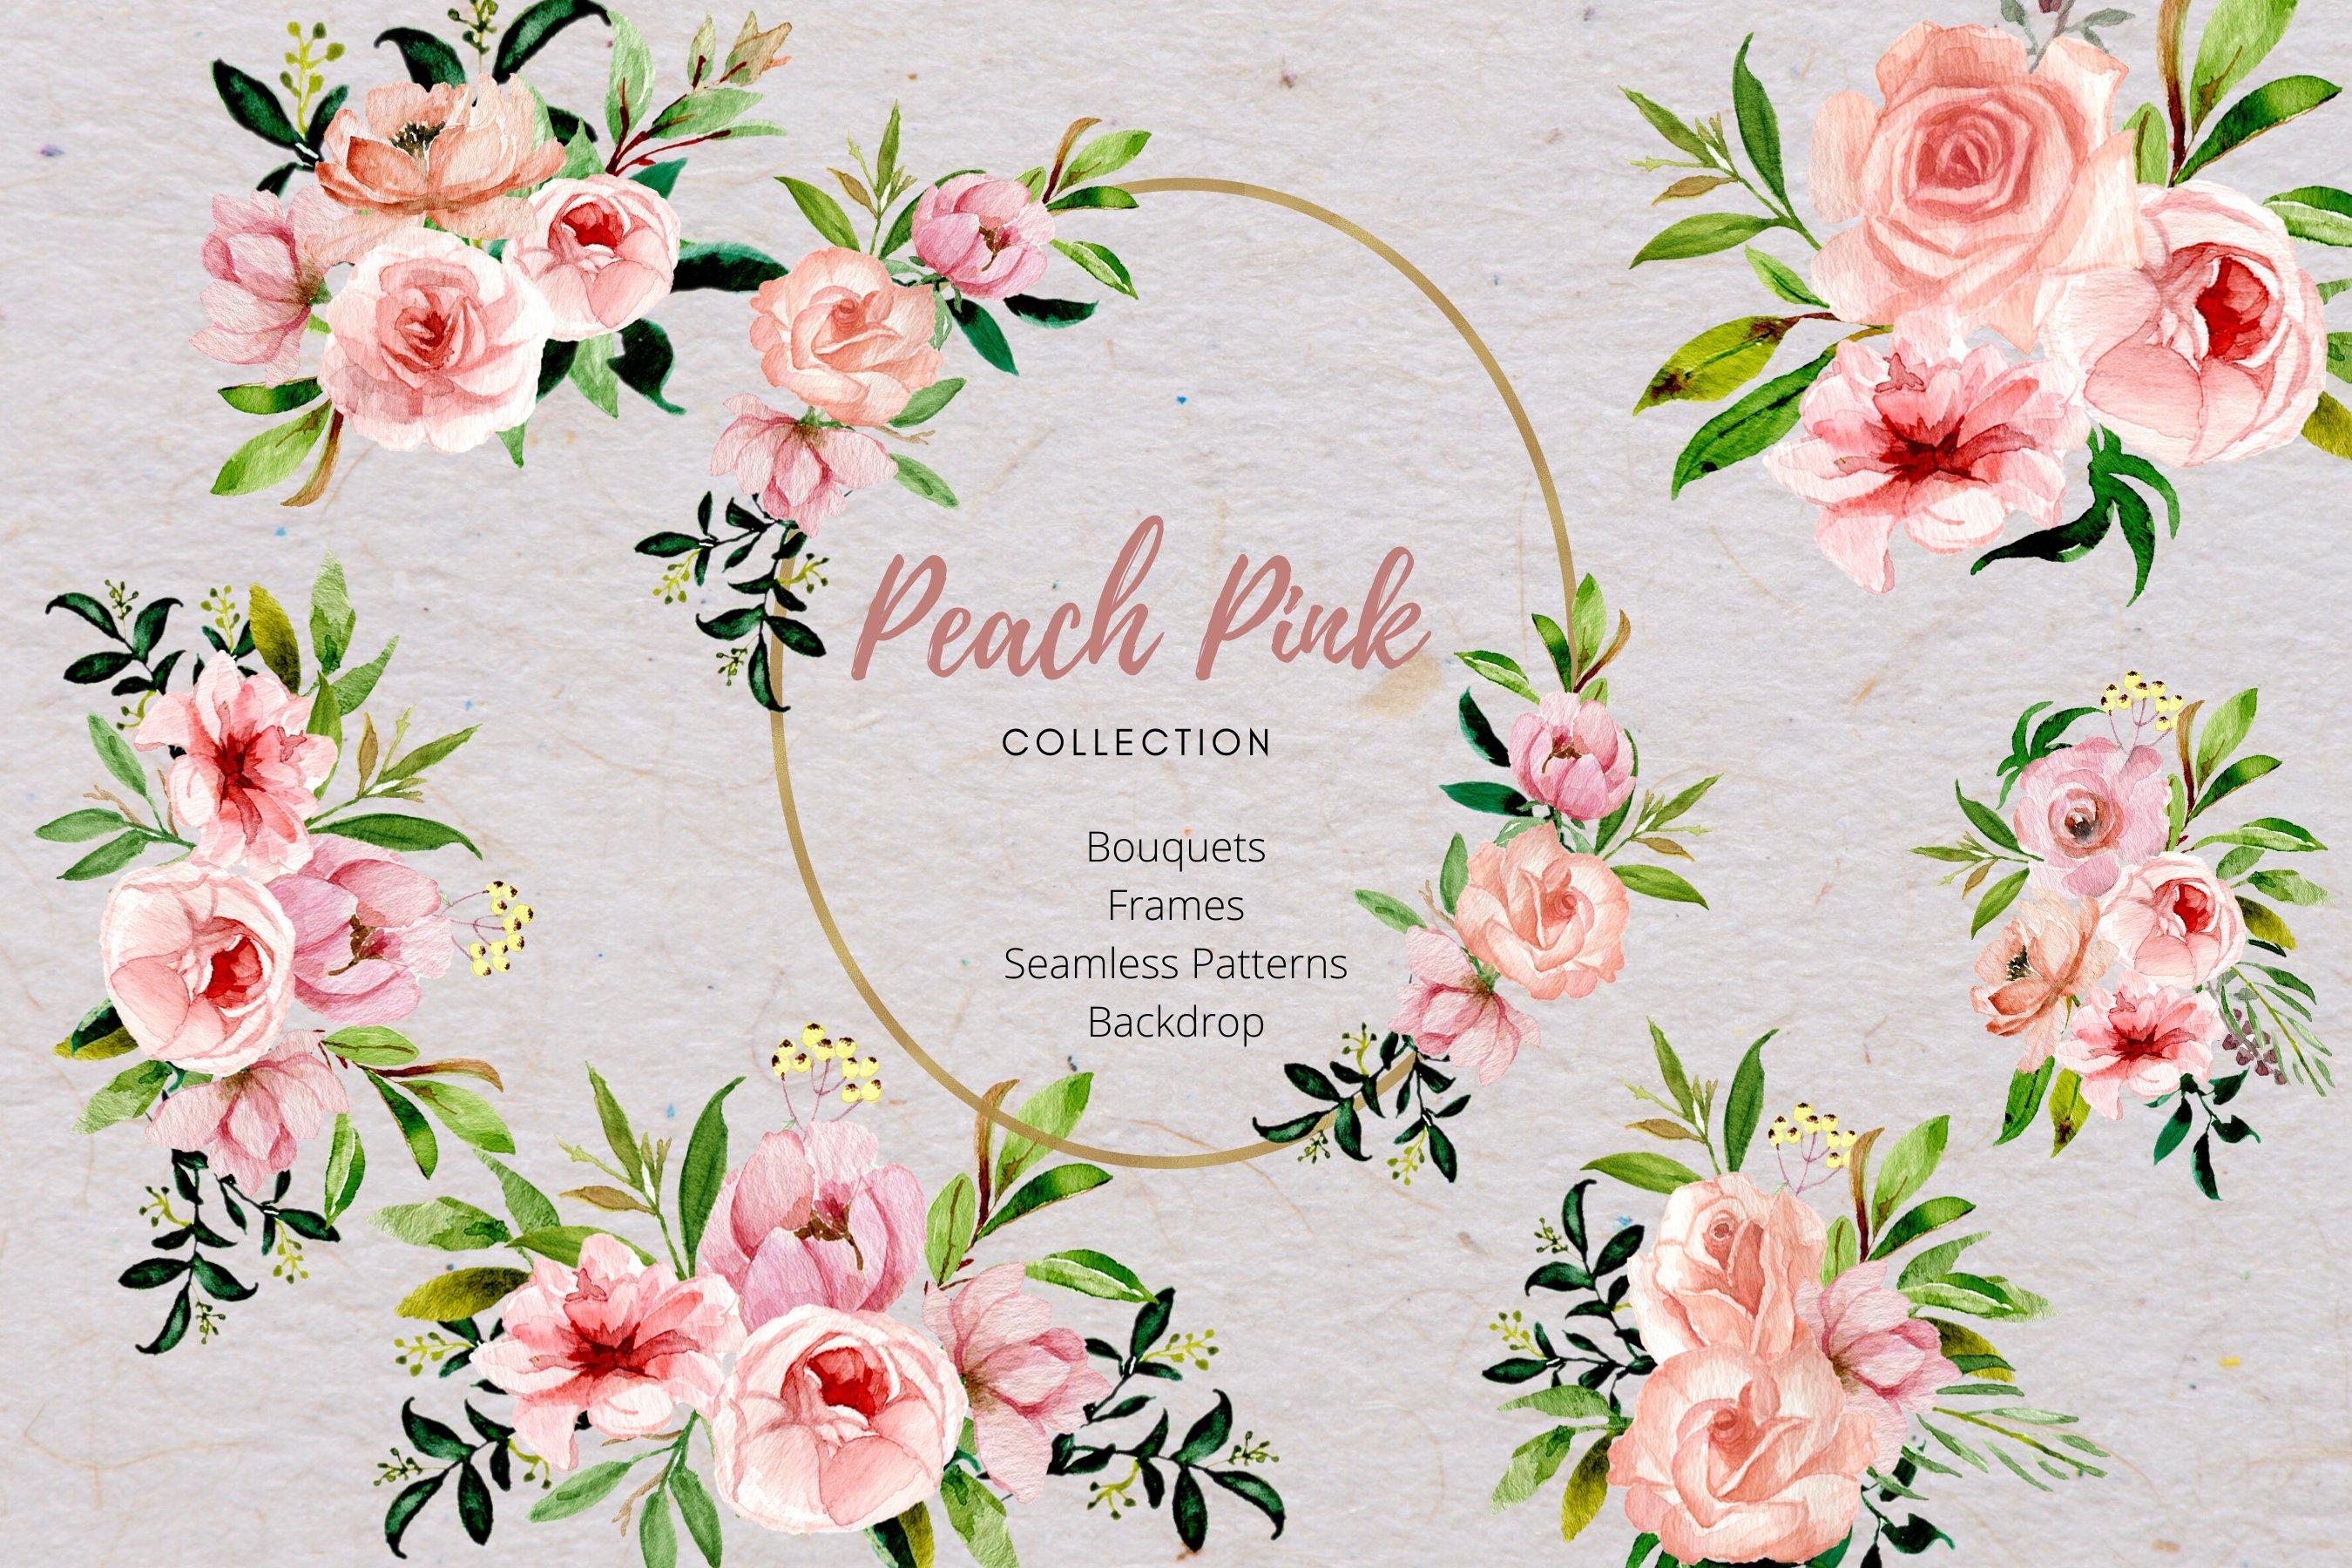 Peach Floral Arrangement PNG Graphics Dusty Pink Rose Bouquet wreath header border frame Blush Watercolor Flower Clipart Set Commercial use